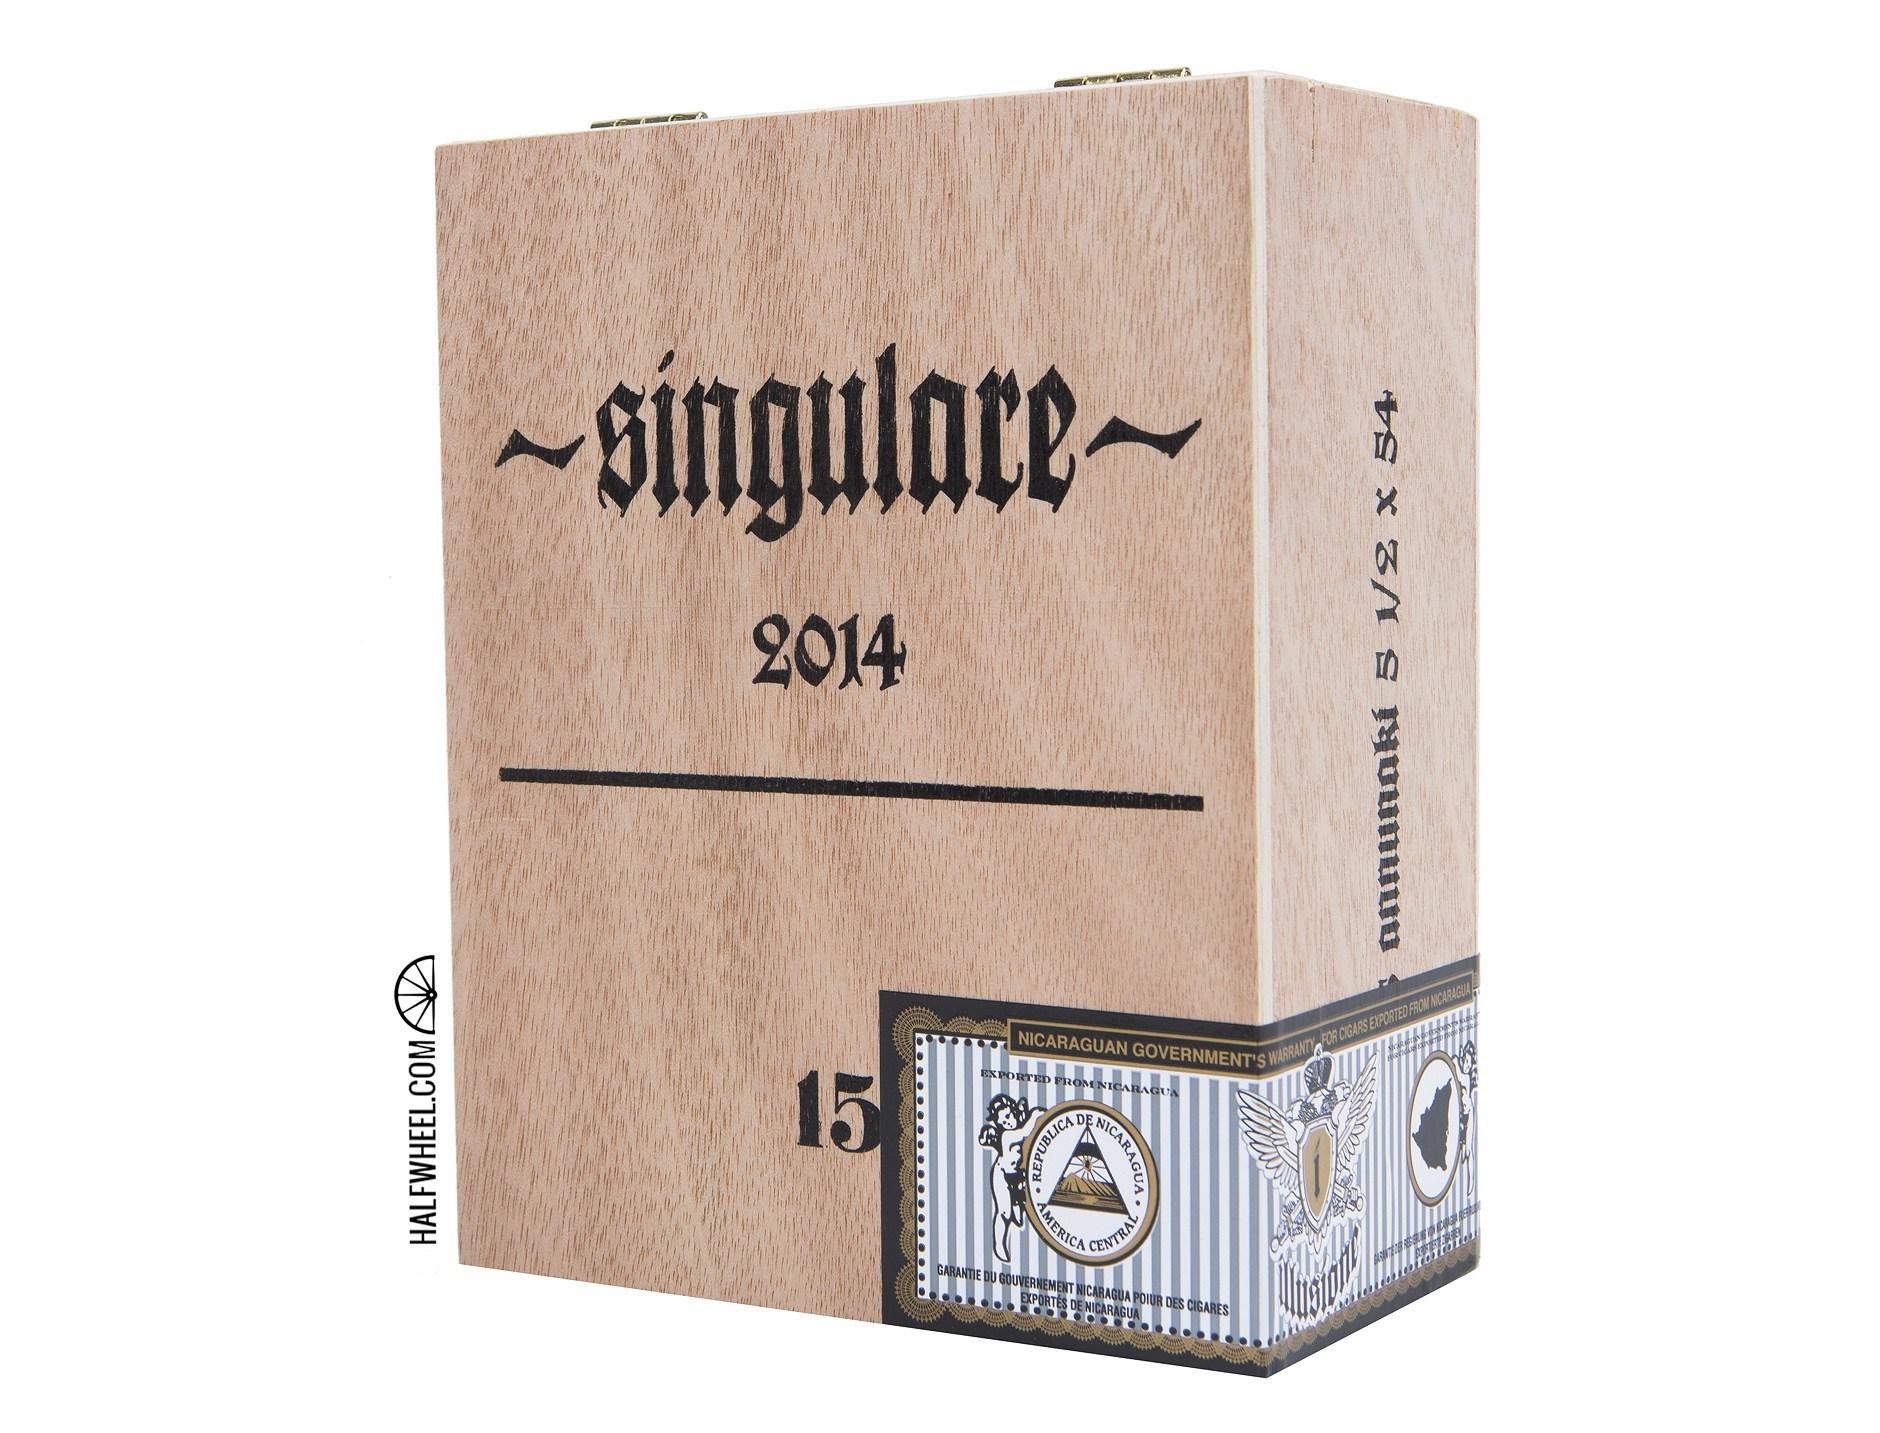 Illusione Singulare 2014 Anunnaki Box 1